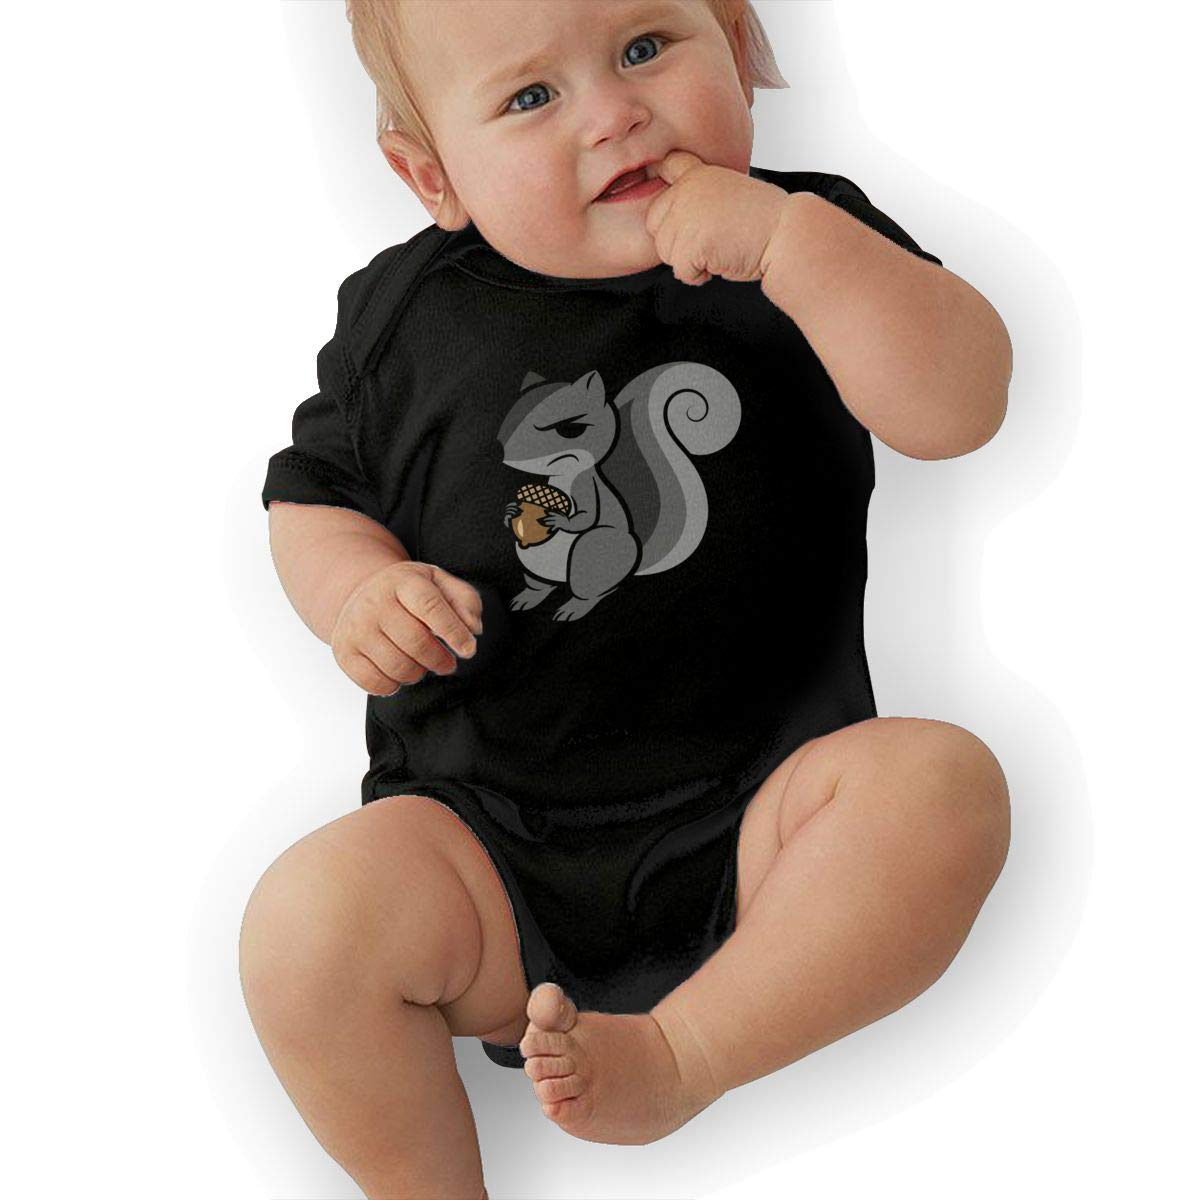 Dfenere Black Retro Newborn Baby Short Sleeve Bodysuit Romper Infant Summer Clothing